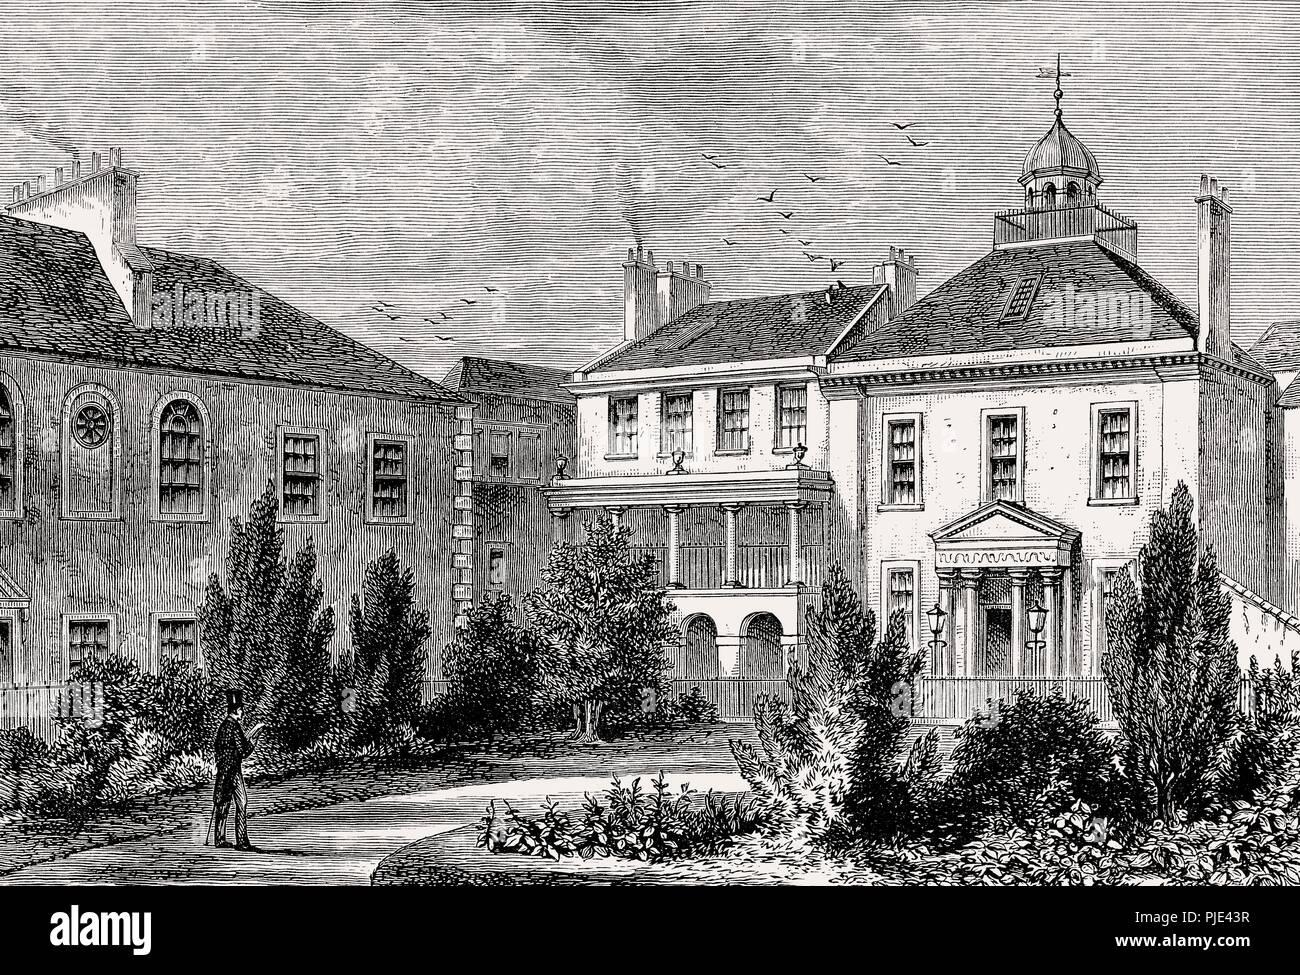 Surgeon's Square in 1829, Edinburgh, Scotland - Stock Image